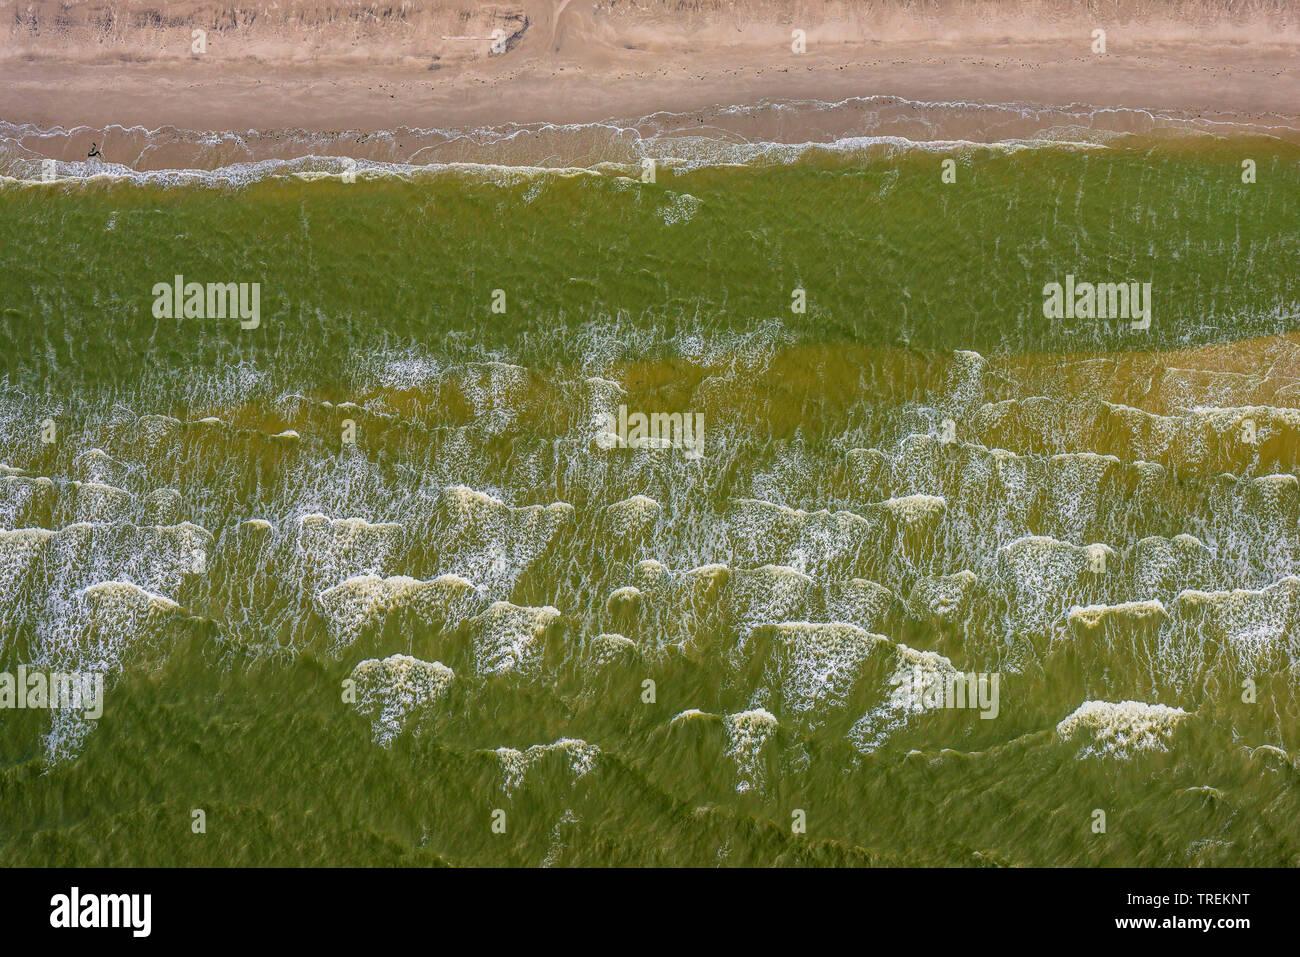 Wellen im Schleswigholsteinischen Wattenmeer, Luftbild, Deutschland, Schleswig-Holstein, Schleswig-Holsteinisches Wattenmeer Nationalpark   aerial of - Stock Image